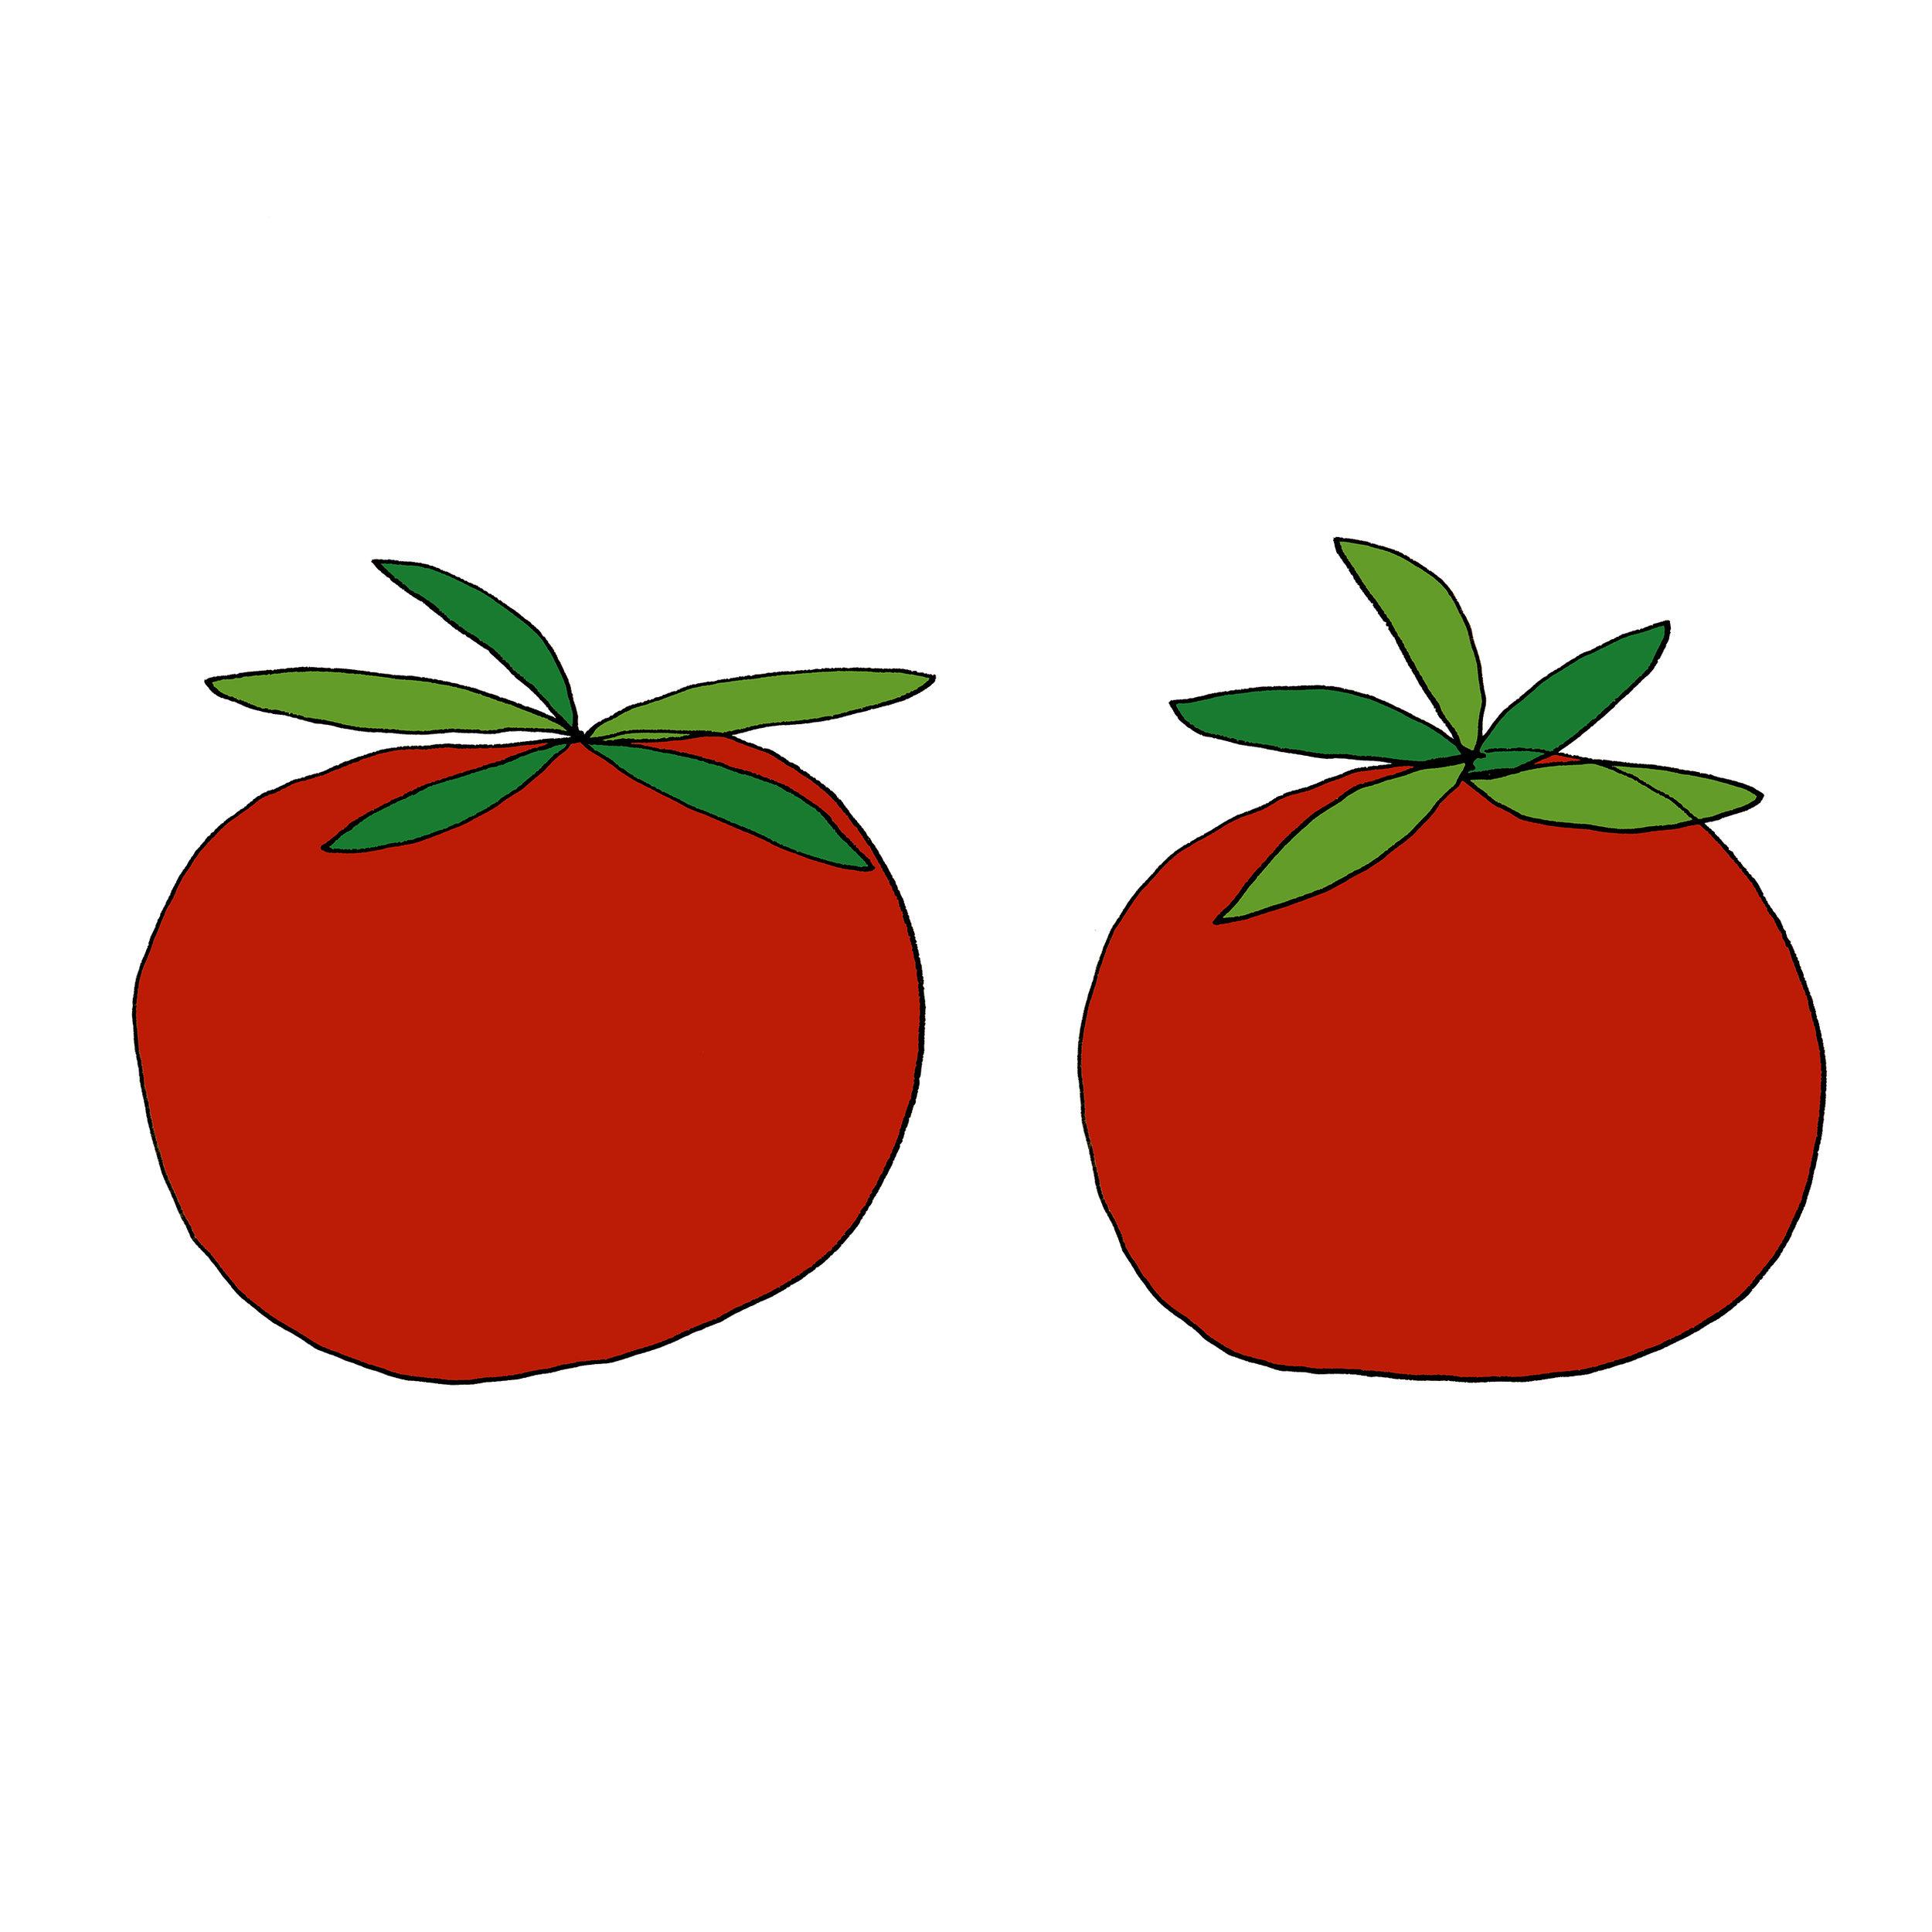 Tomato Illustration by Emma Freeman Designs